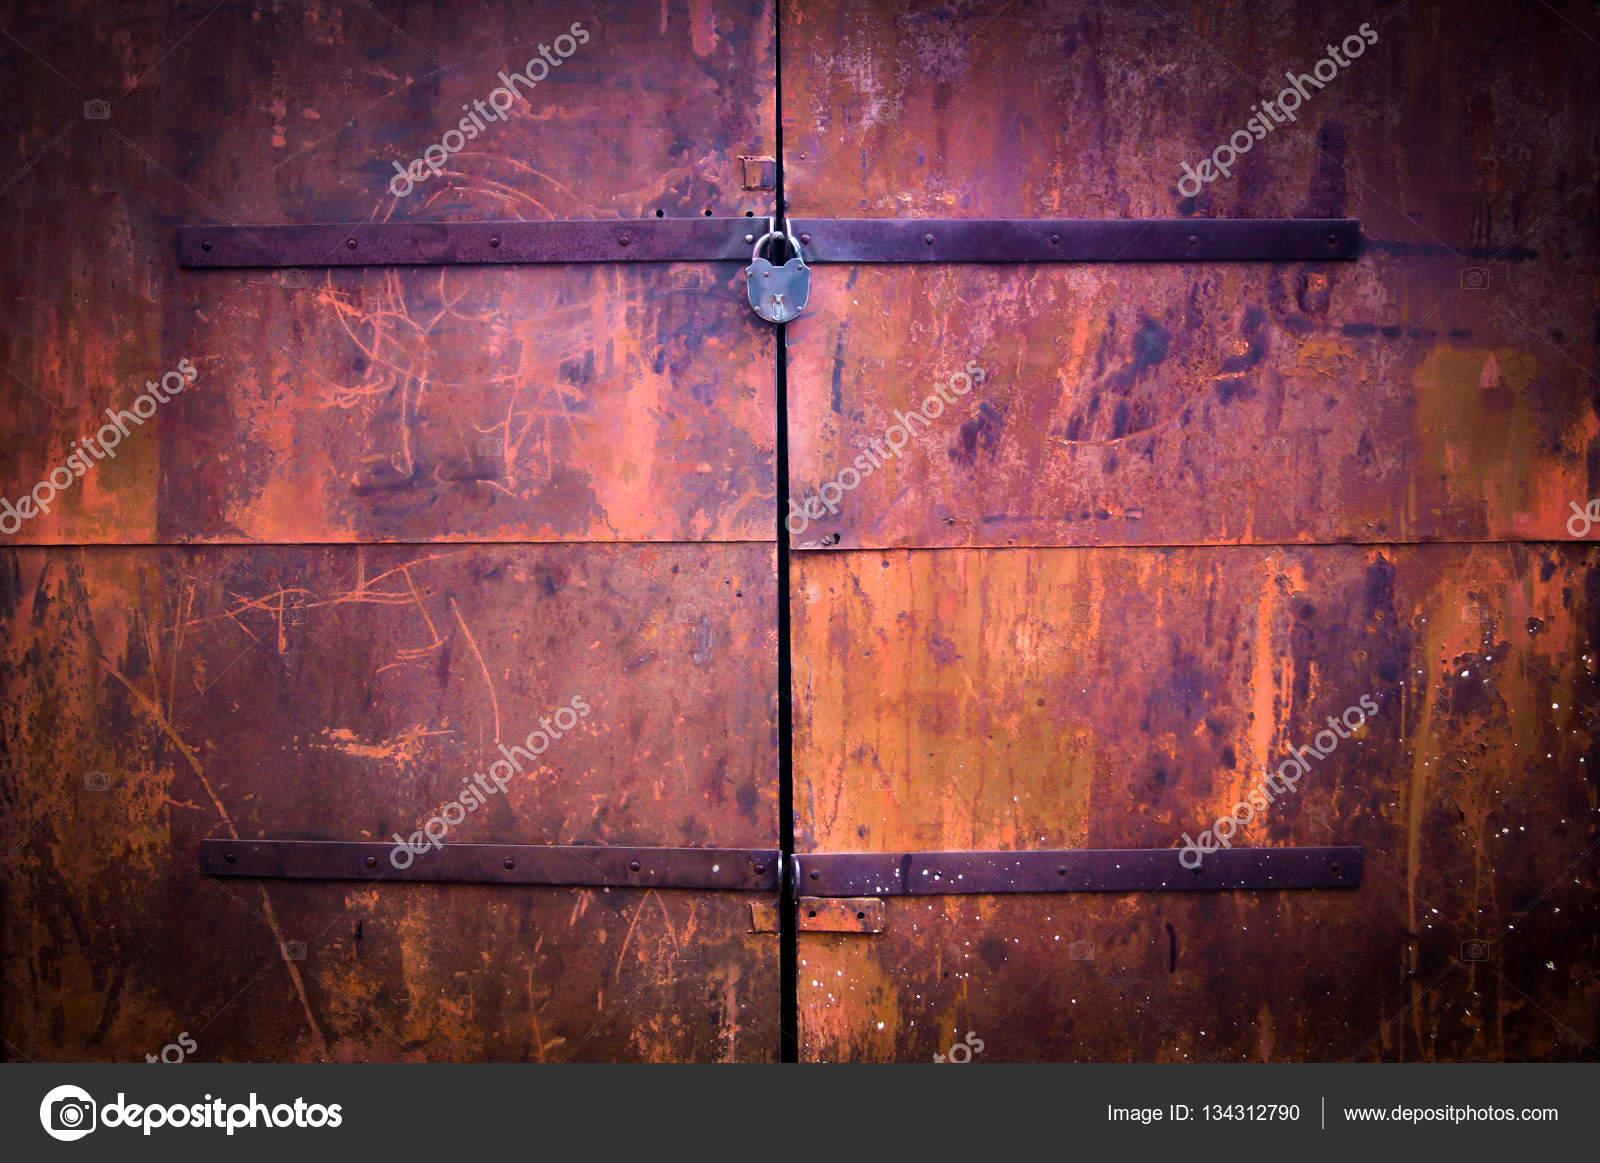 Rusty Steel Garage Door Strips Of Rusting As The Strokes Of Paint